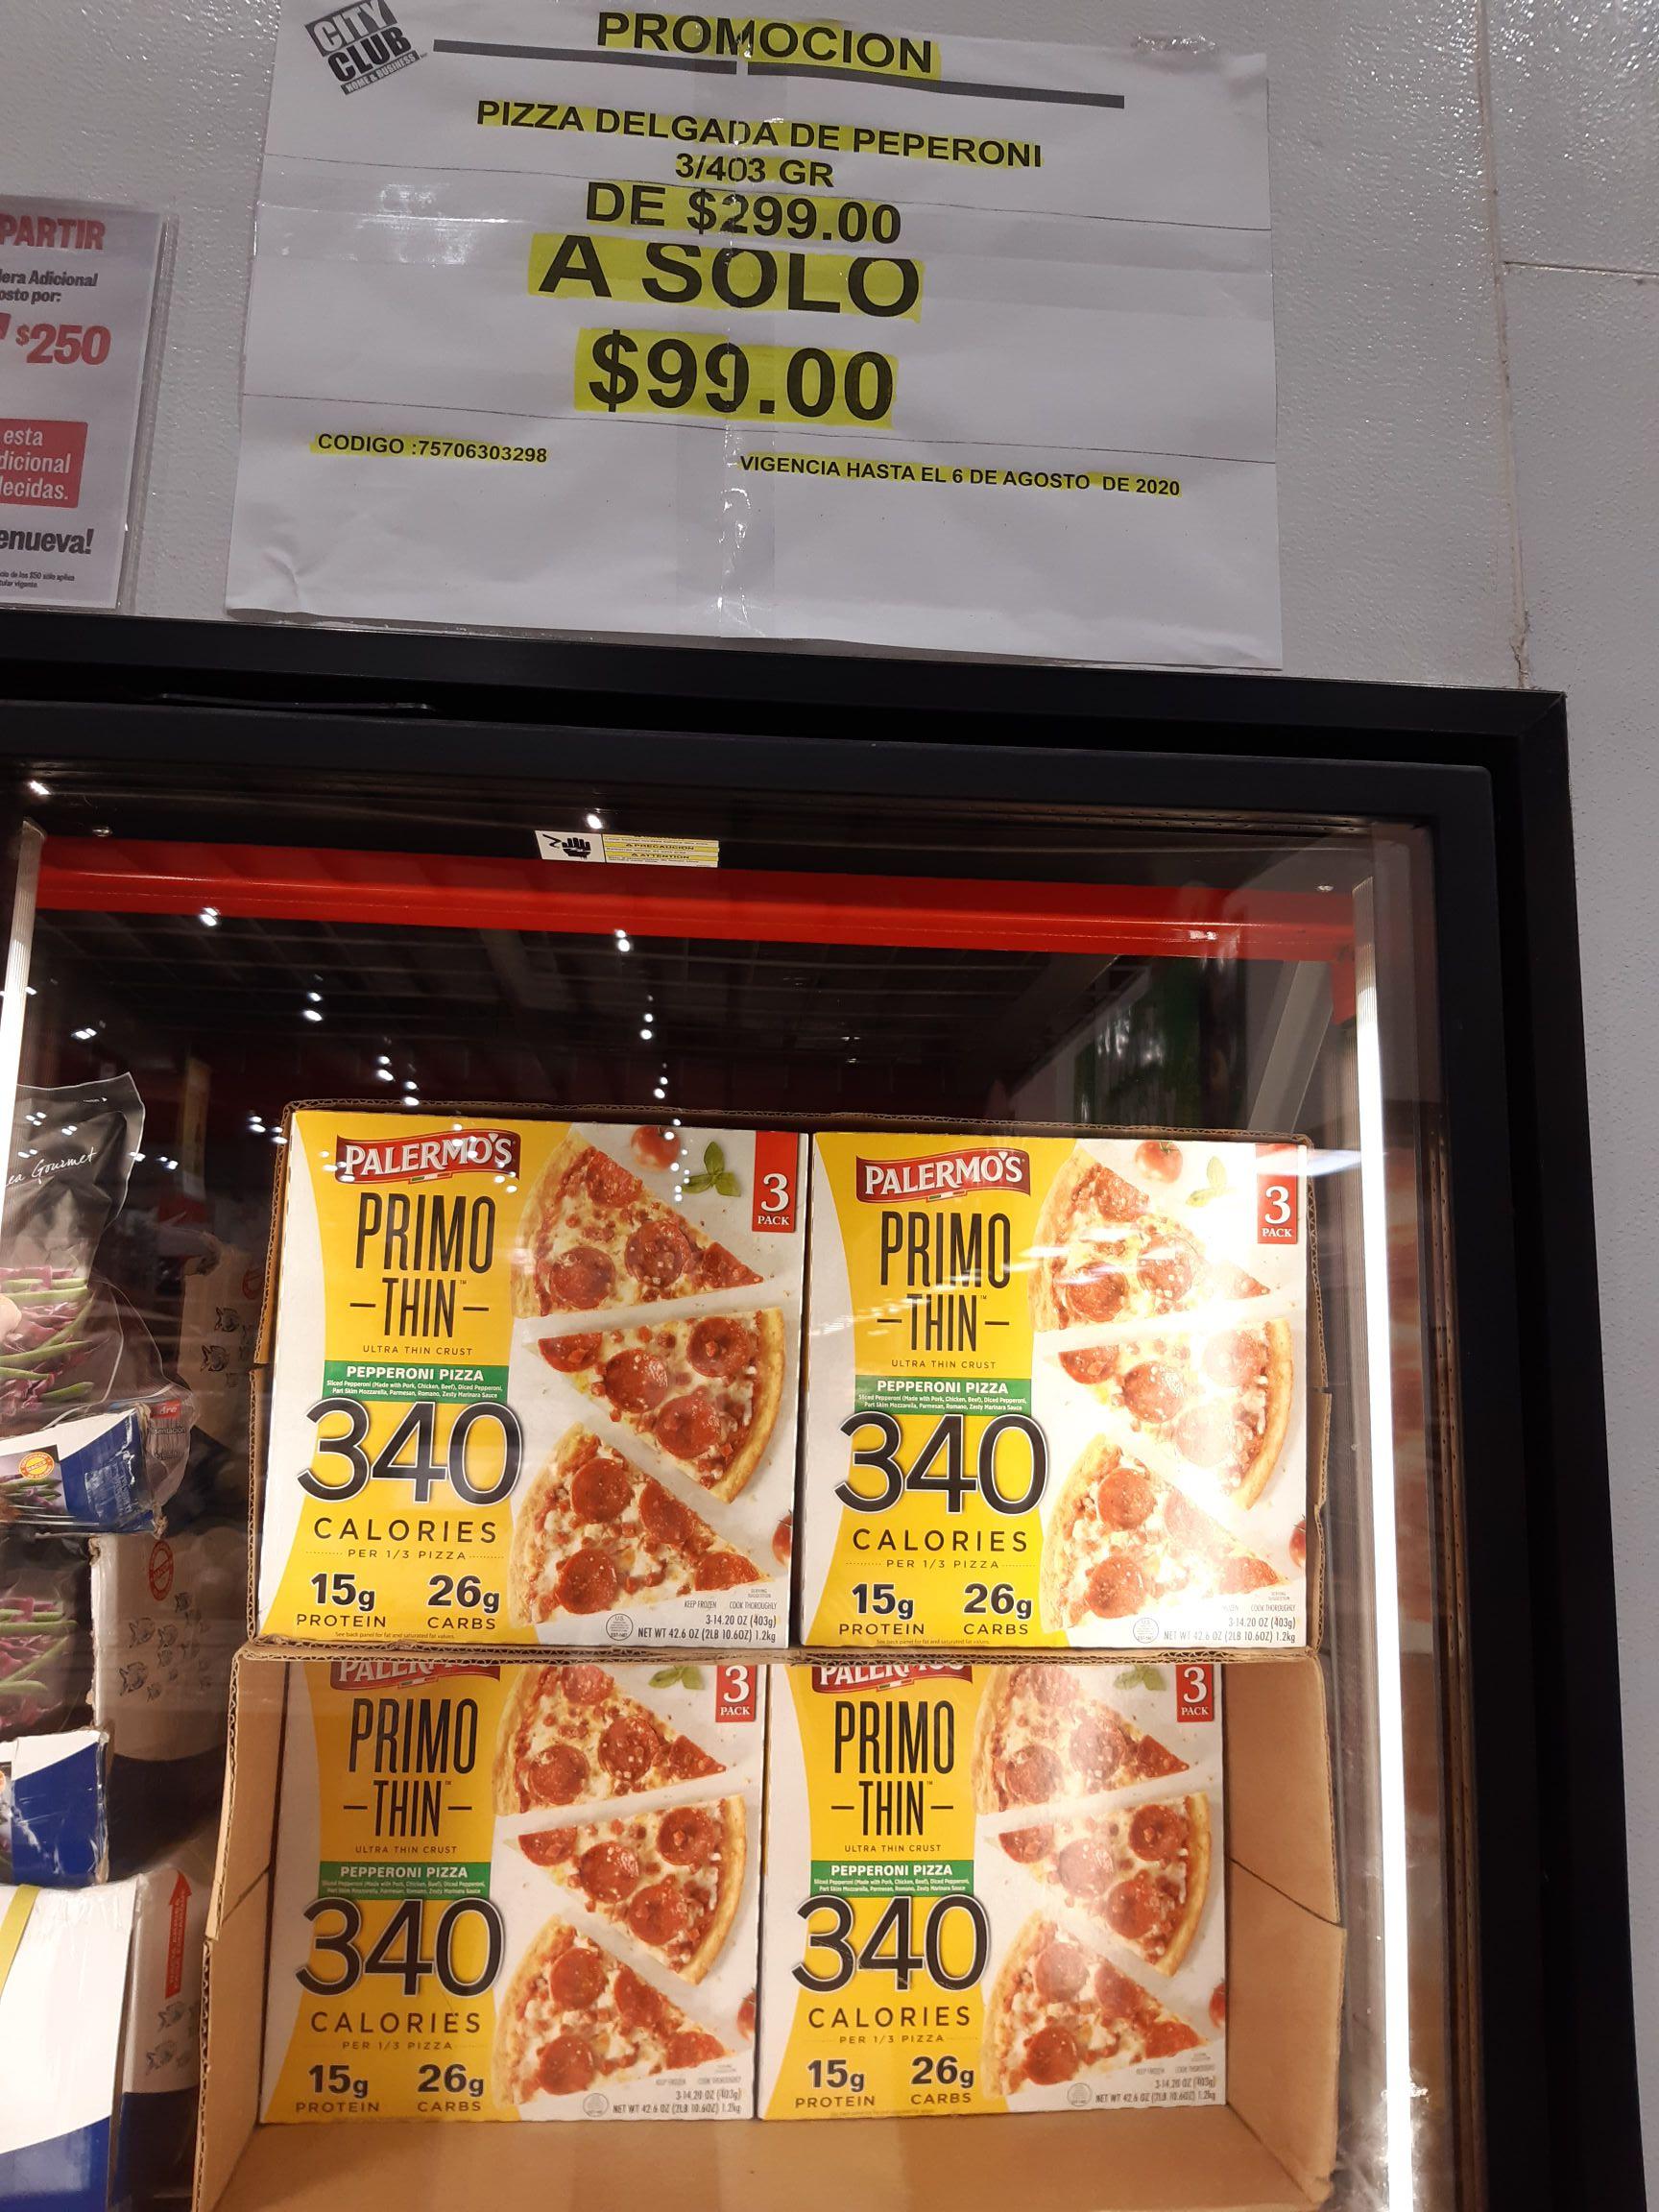 City Club: 3 Pizzas Palermo's pepperoni